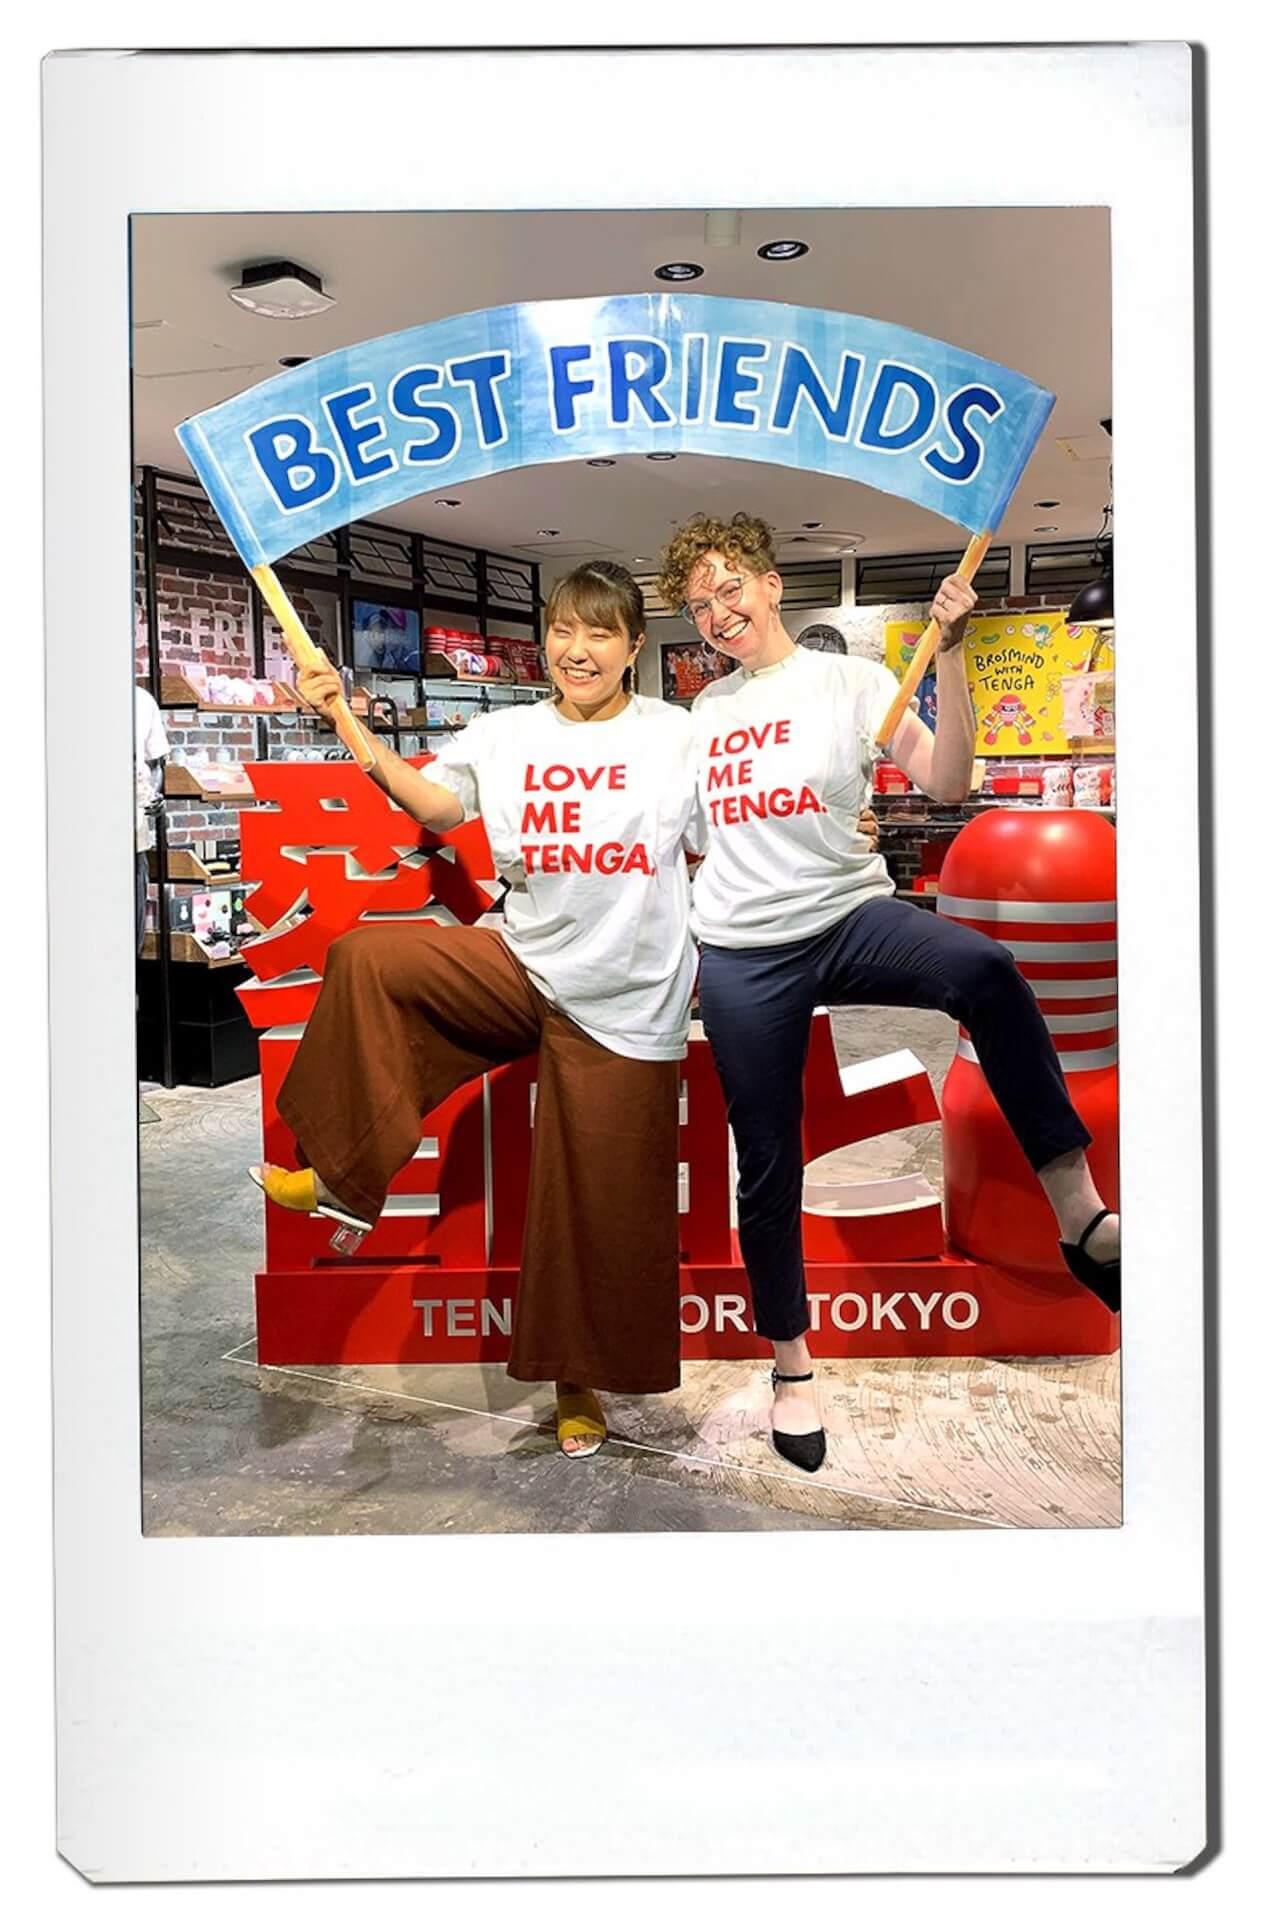 友情、努力、〇〇!TENGA×漫☆画太郎の作品展「TEN☆画太郎展」が開催 music190919-tengataro-4